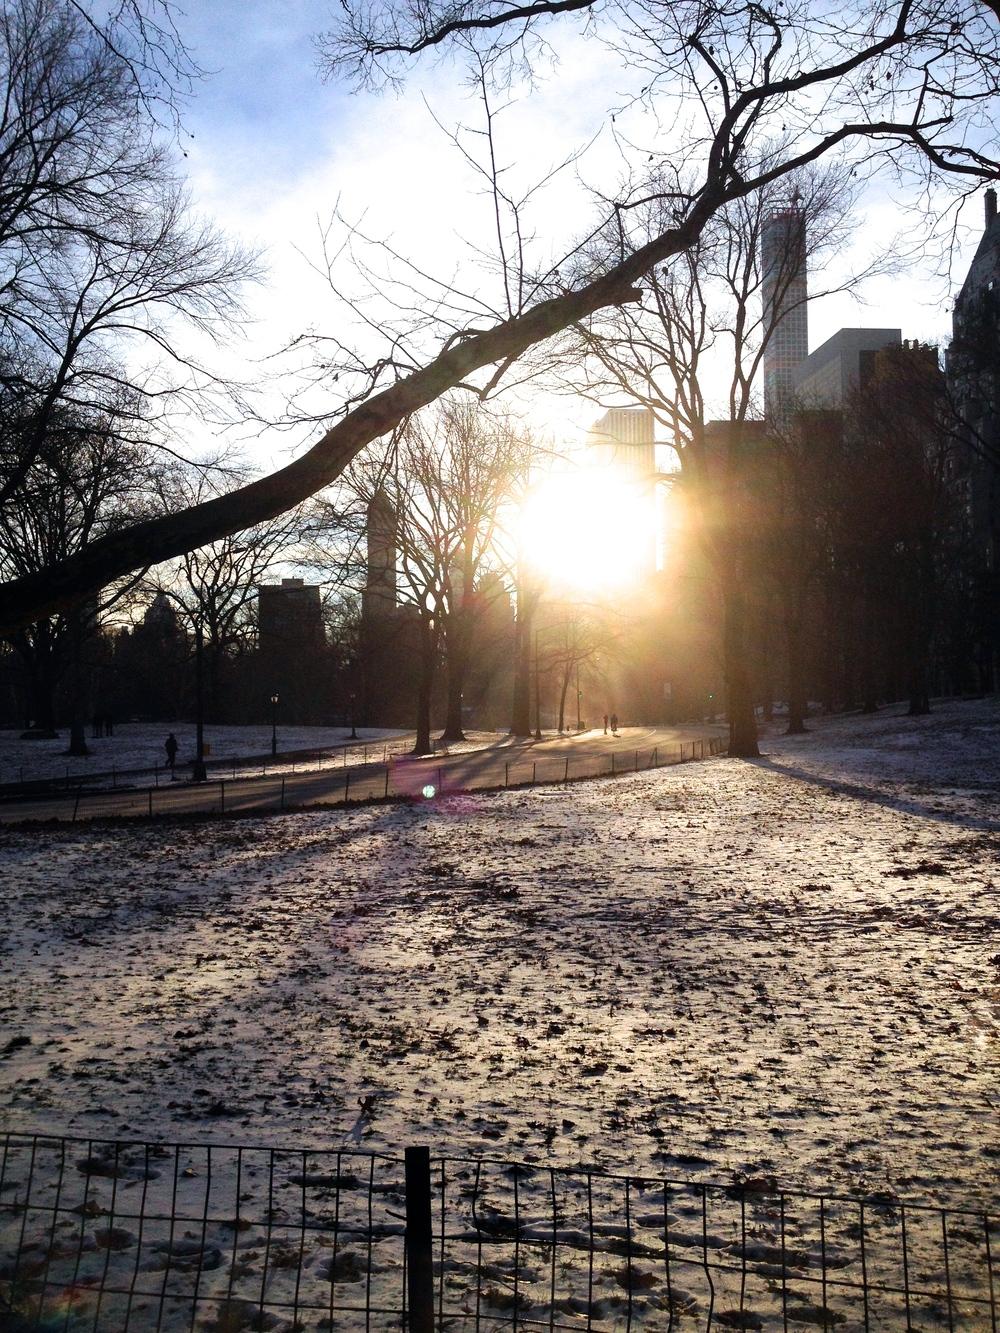 Wintery wonderland in Central Park